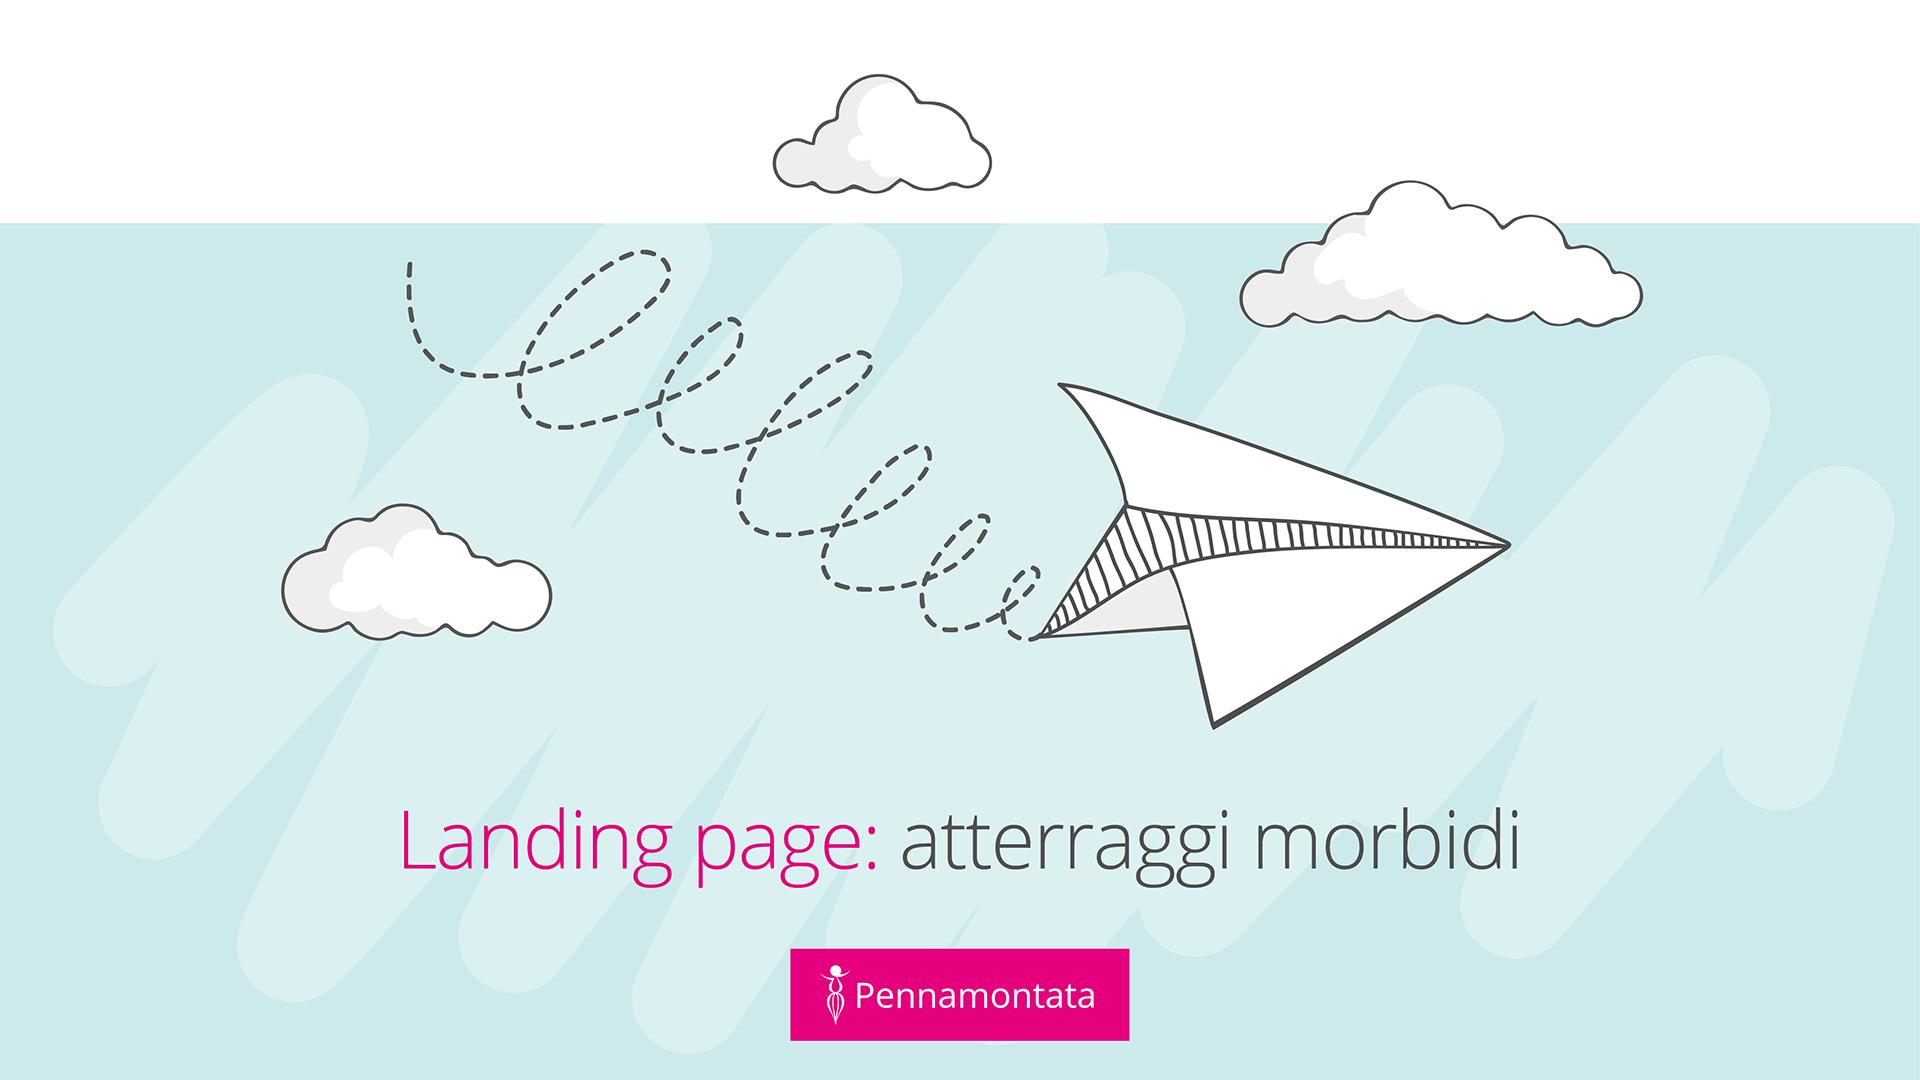 Consigli per landing page efficaci